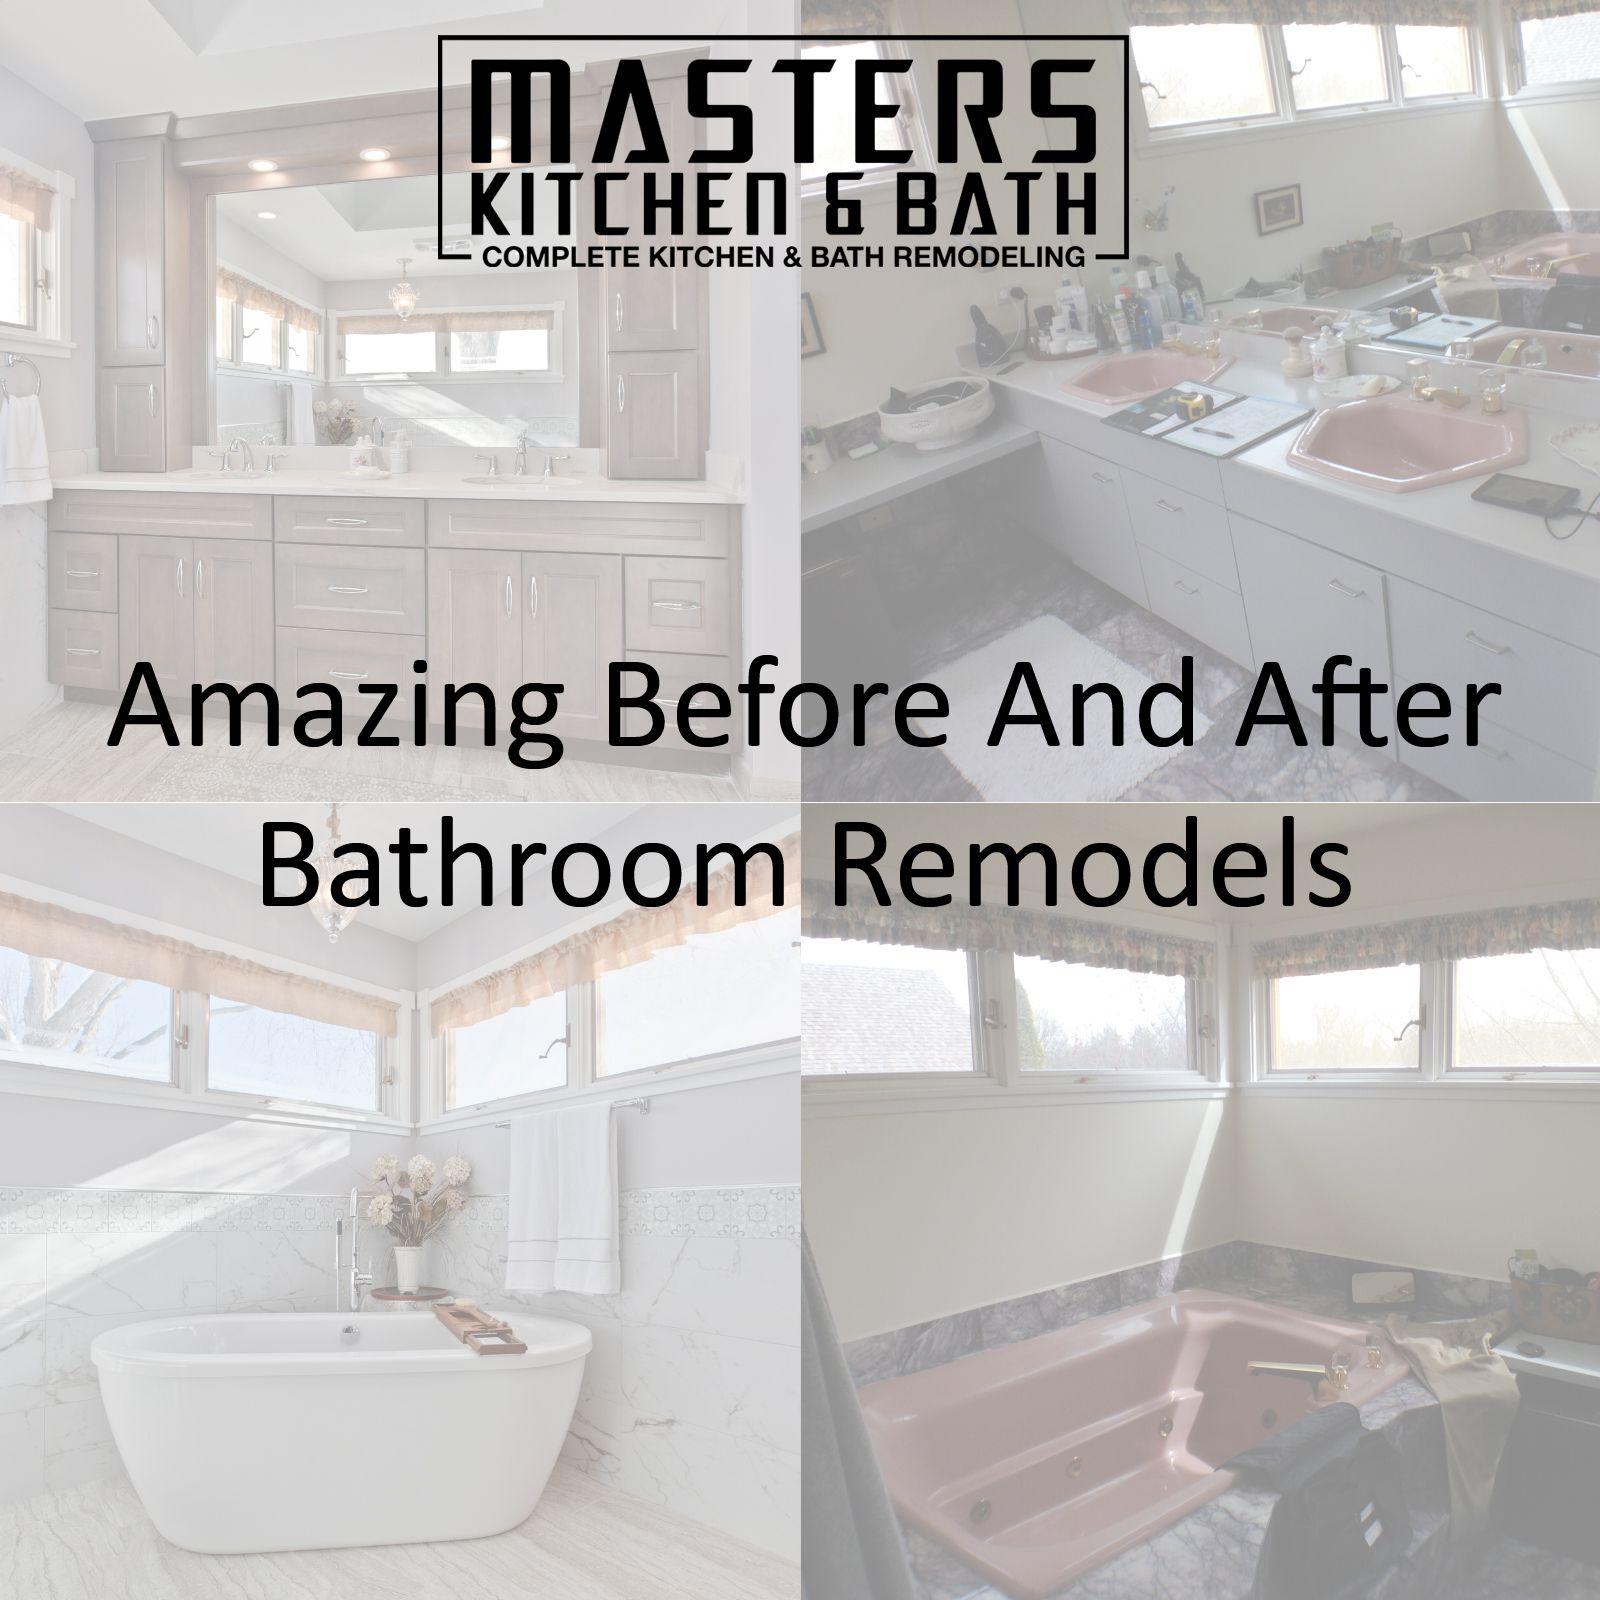 Amazing Bathroom Remodels In 2020 Bathrooms Remodel Remodel Bathroom Transformation